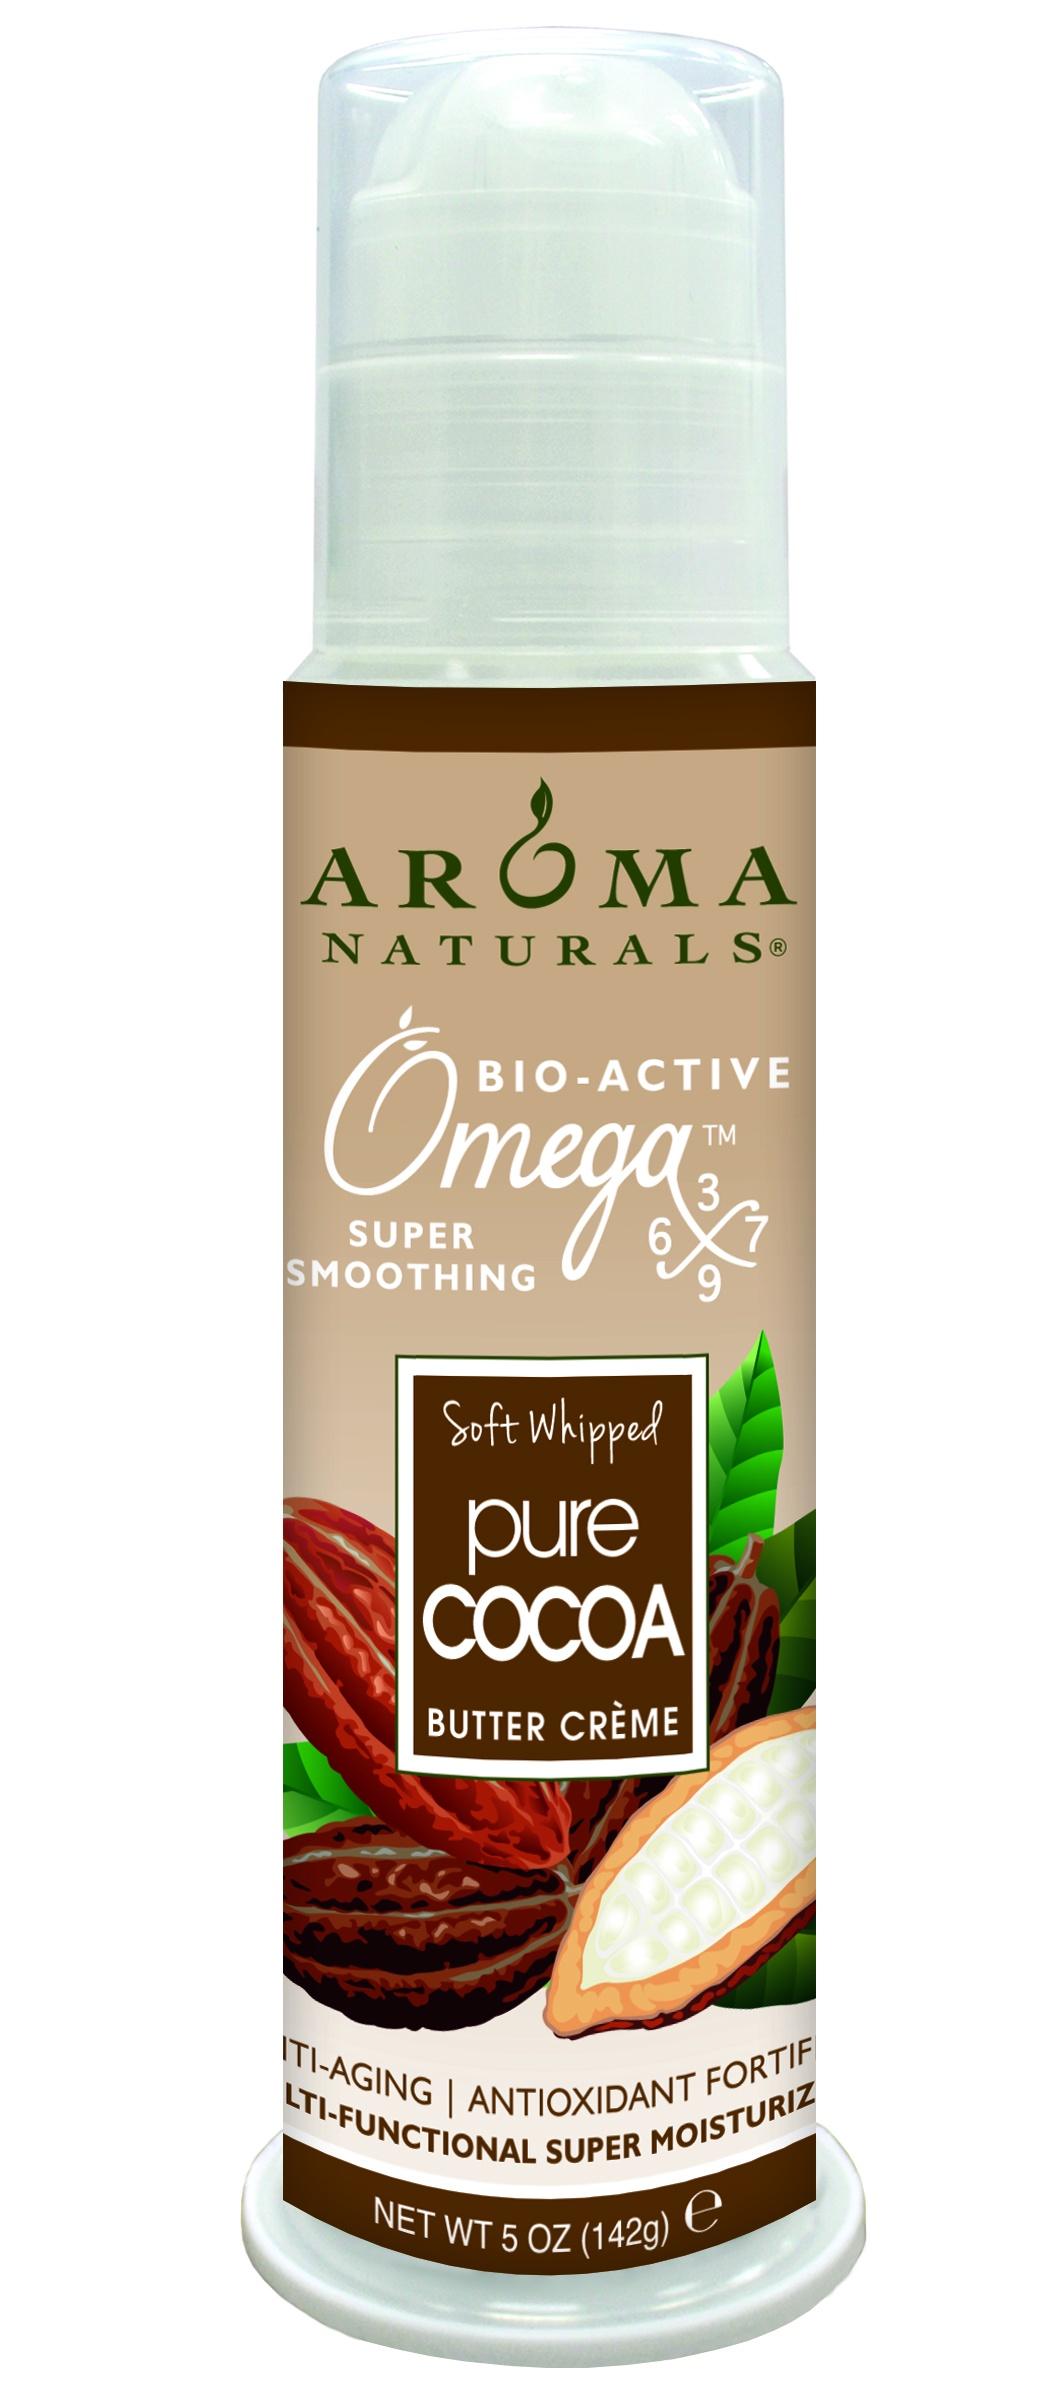 Aroma Naturals Супер увлажняющий крем с маслом какао, 142 г крем amazing aroma naturals